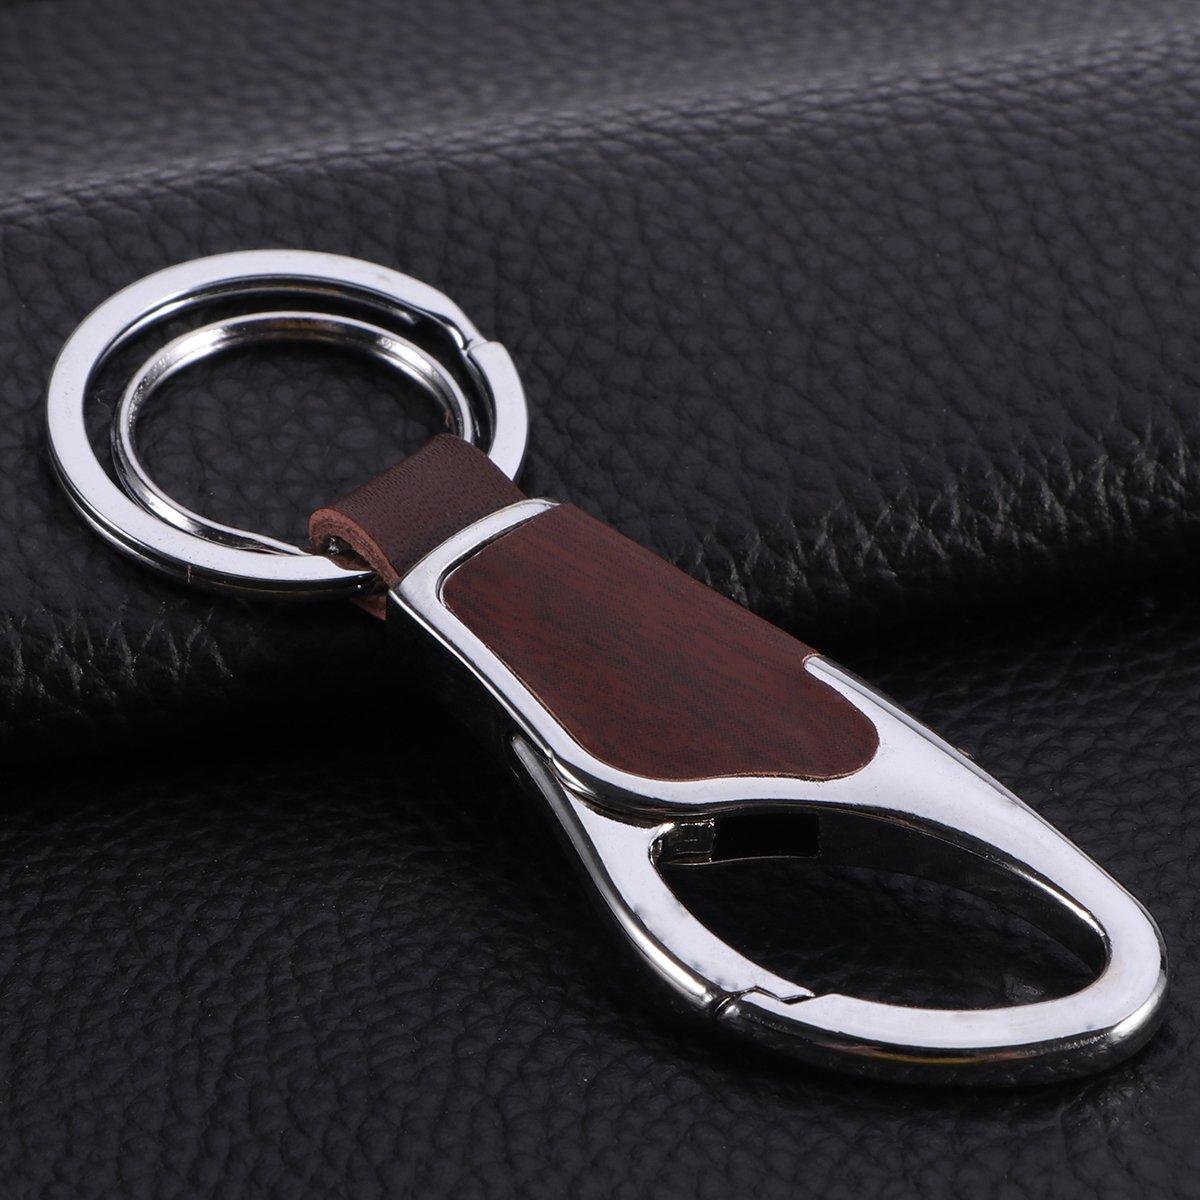 Amazon.com: WINOMO Mens Leather Key Chain Metal Keychain ...